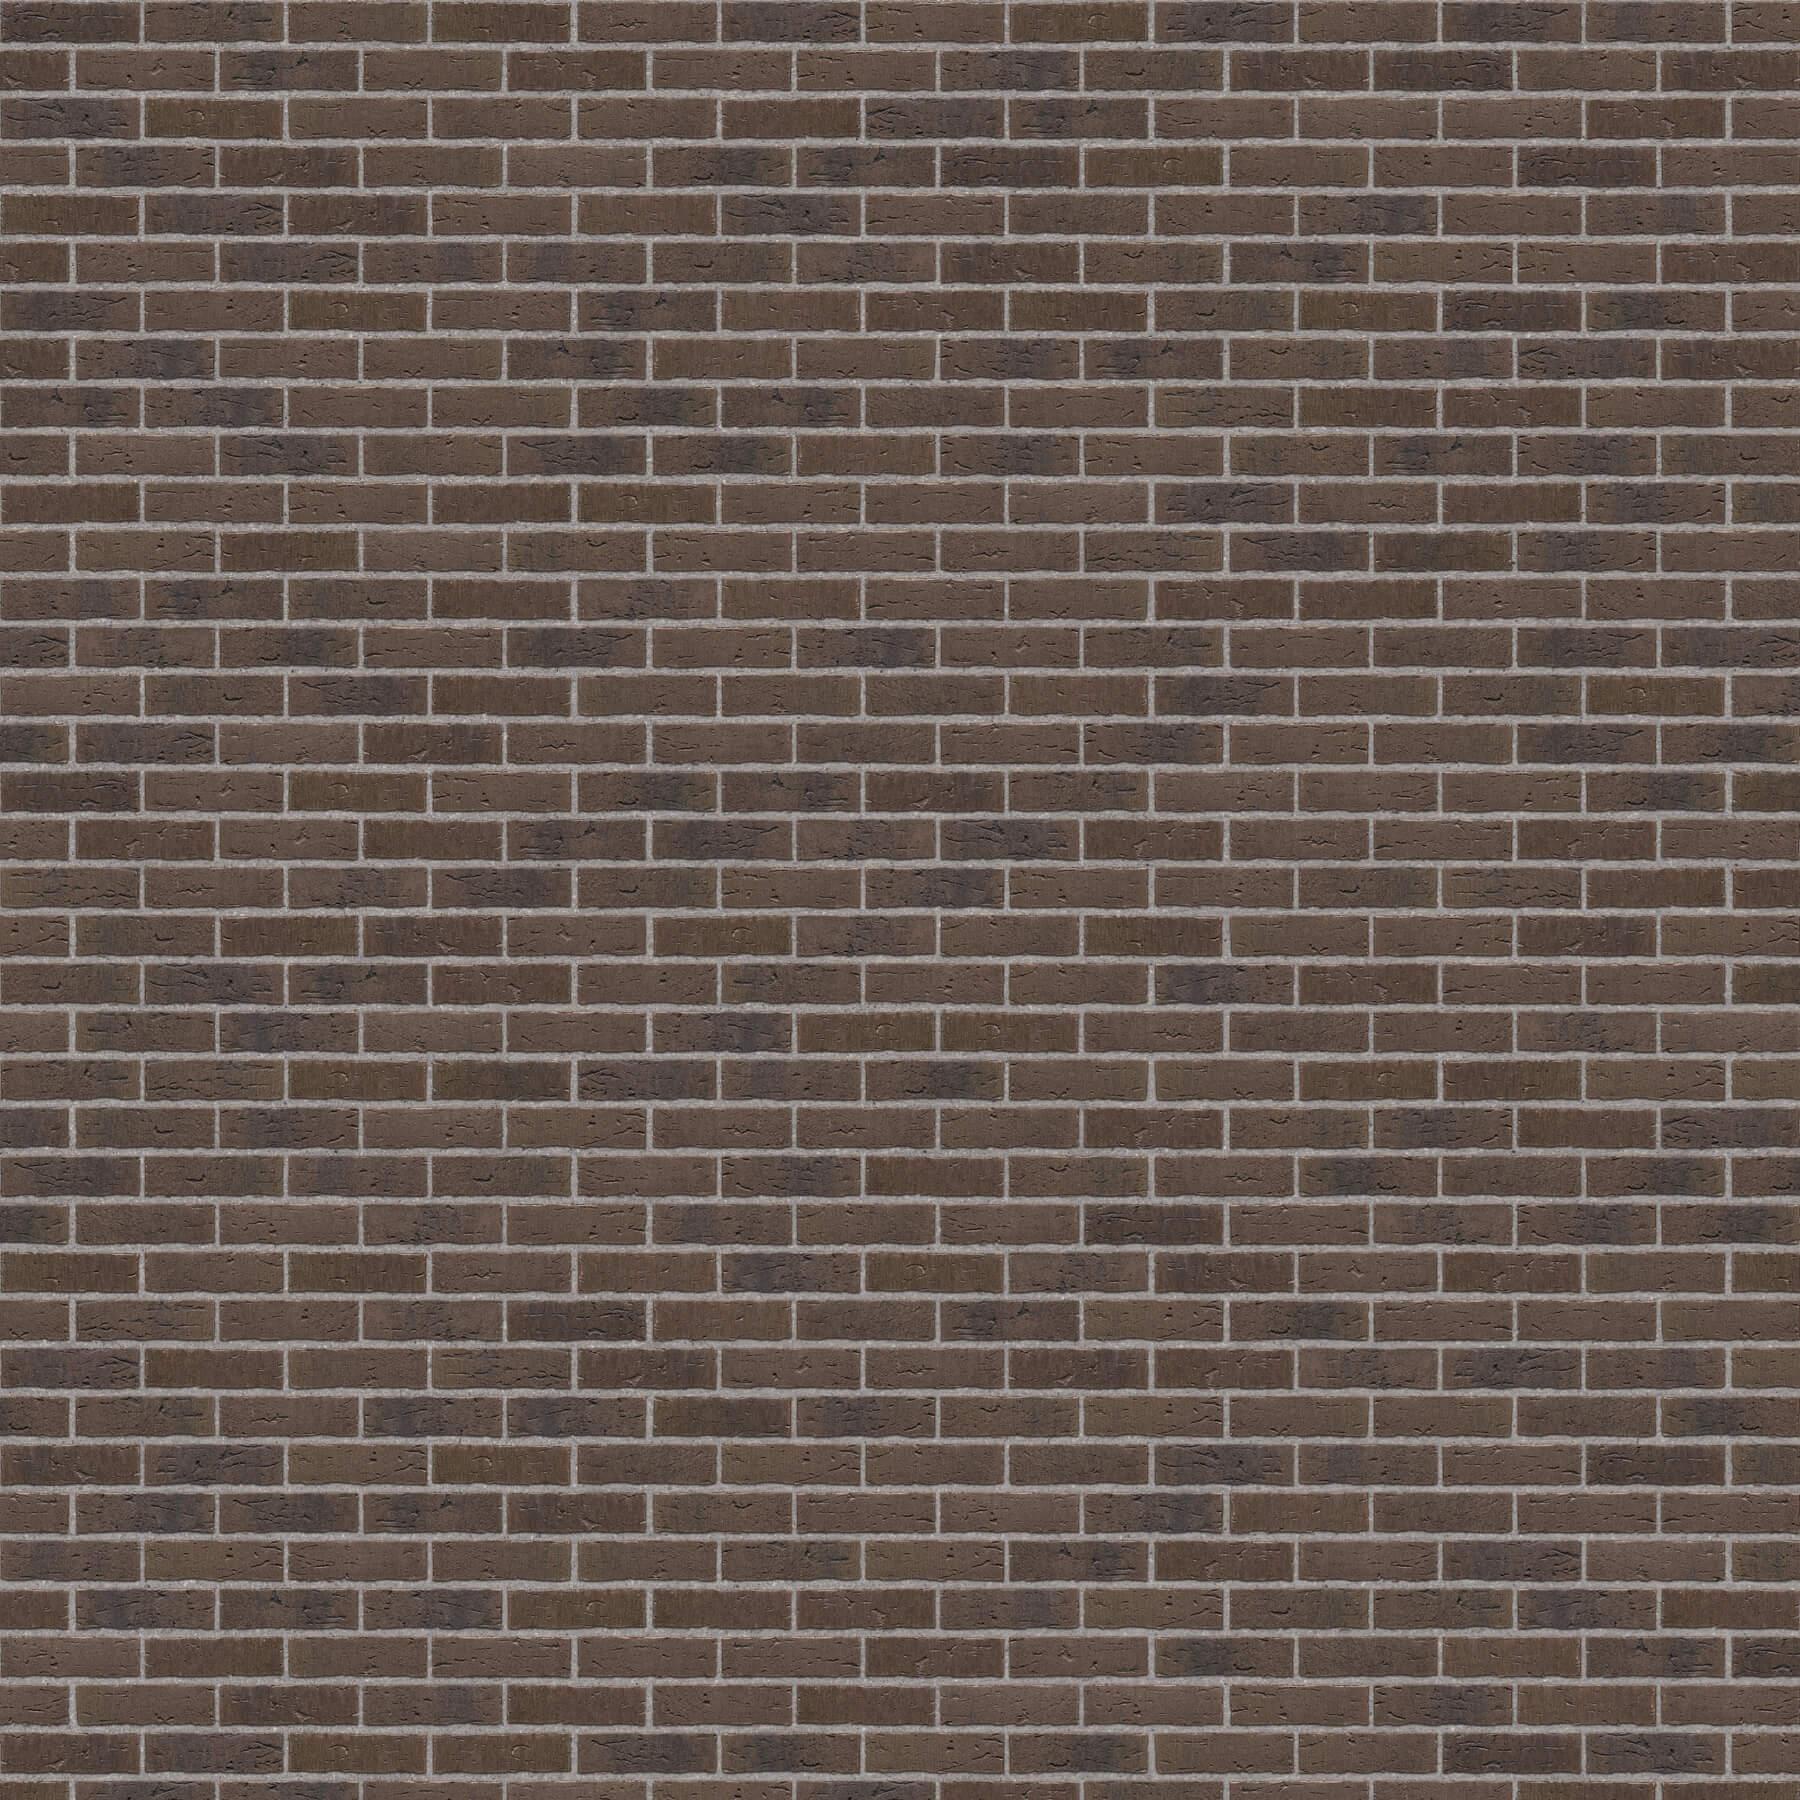 Dekorativna cigla listela FeldHaus Klinker r-697 nf Siva Fuga